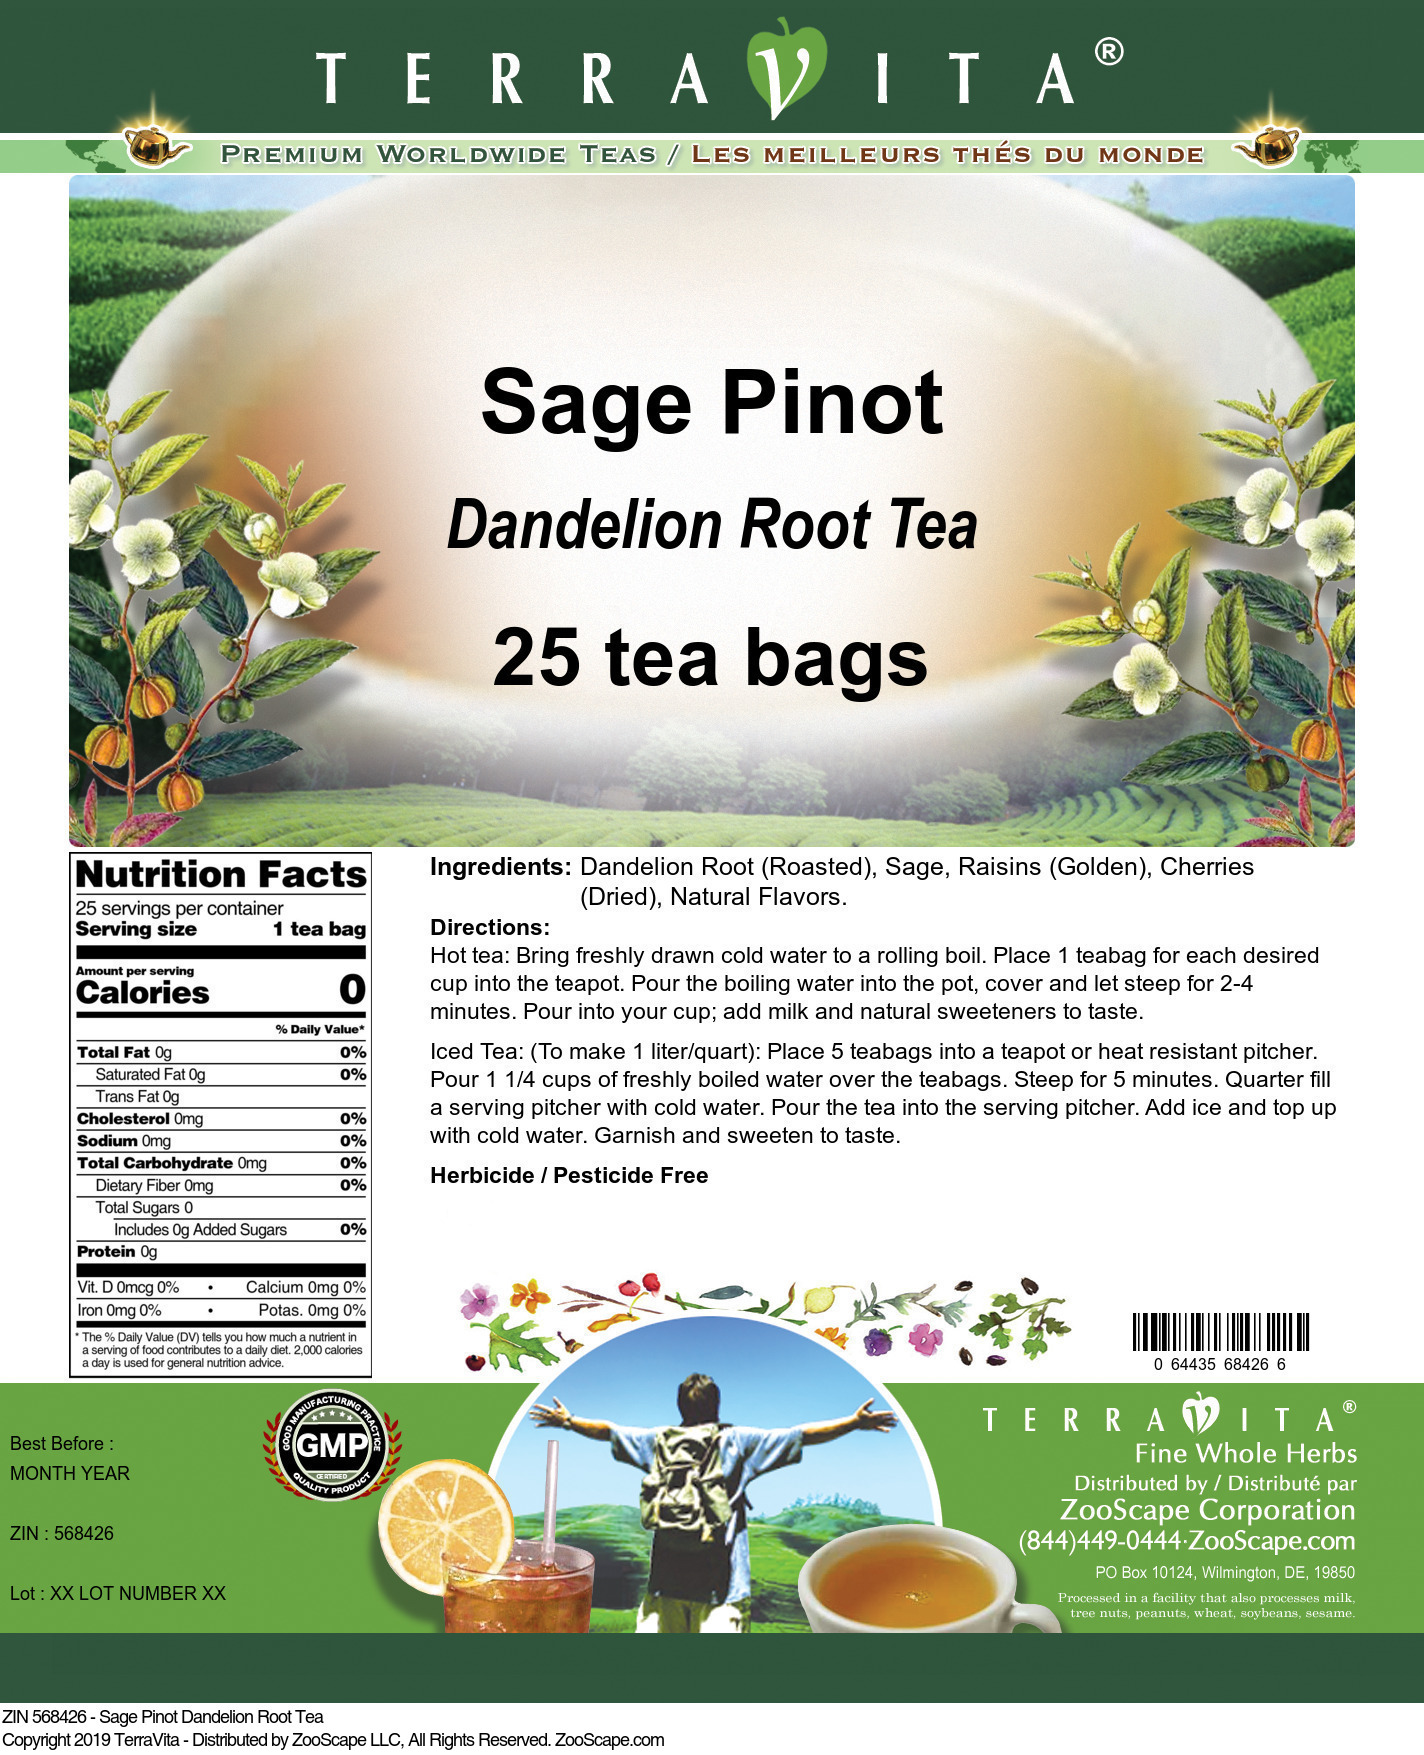 Sage Pinot Dandelion Root Tea